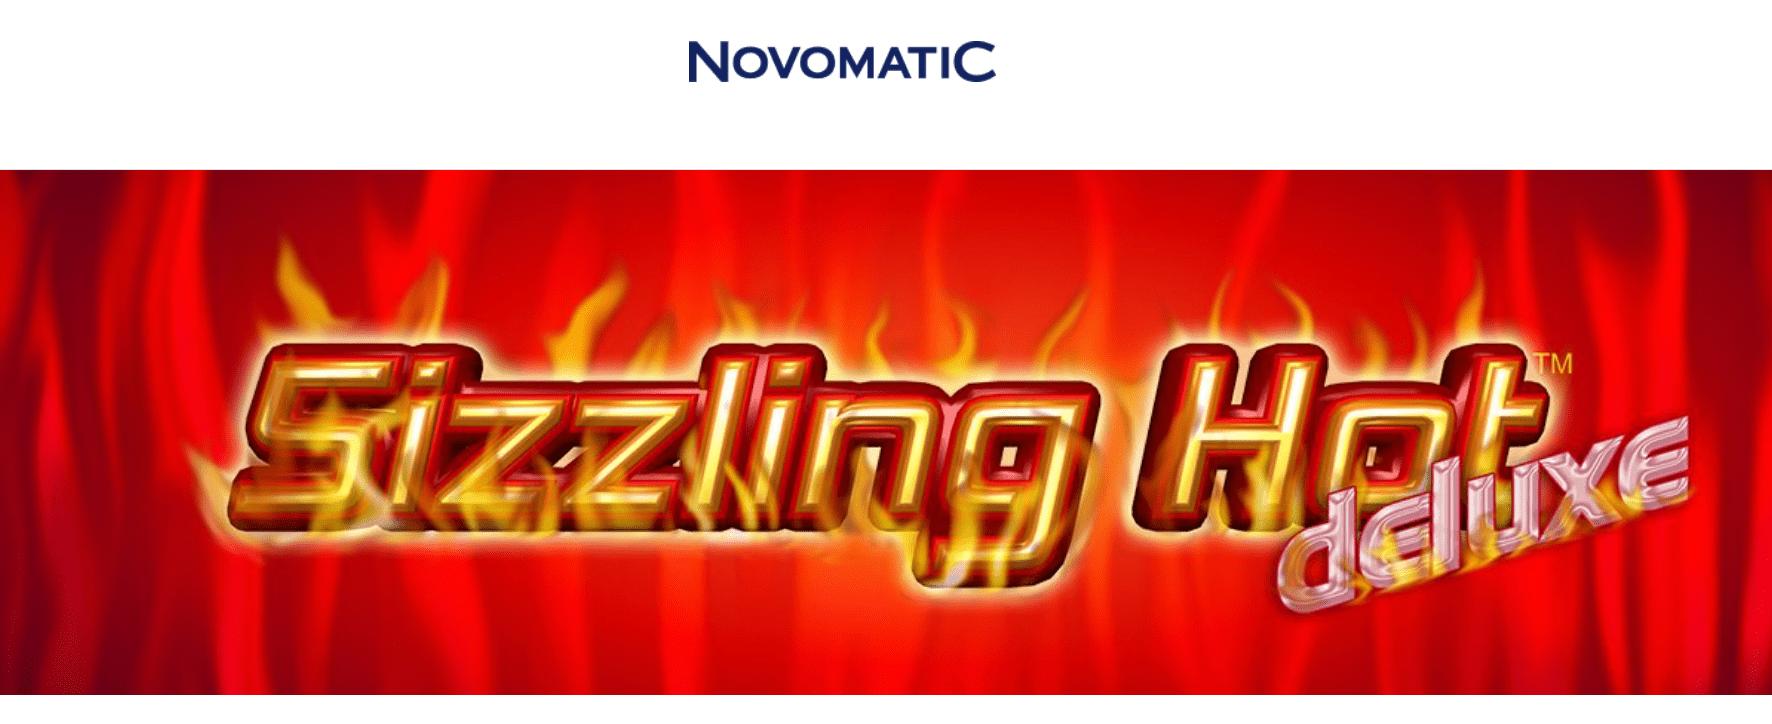 Sizzling Hot Deluxe Novomatic